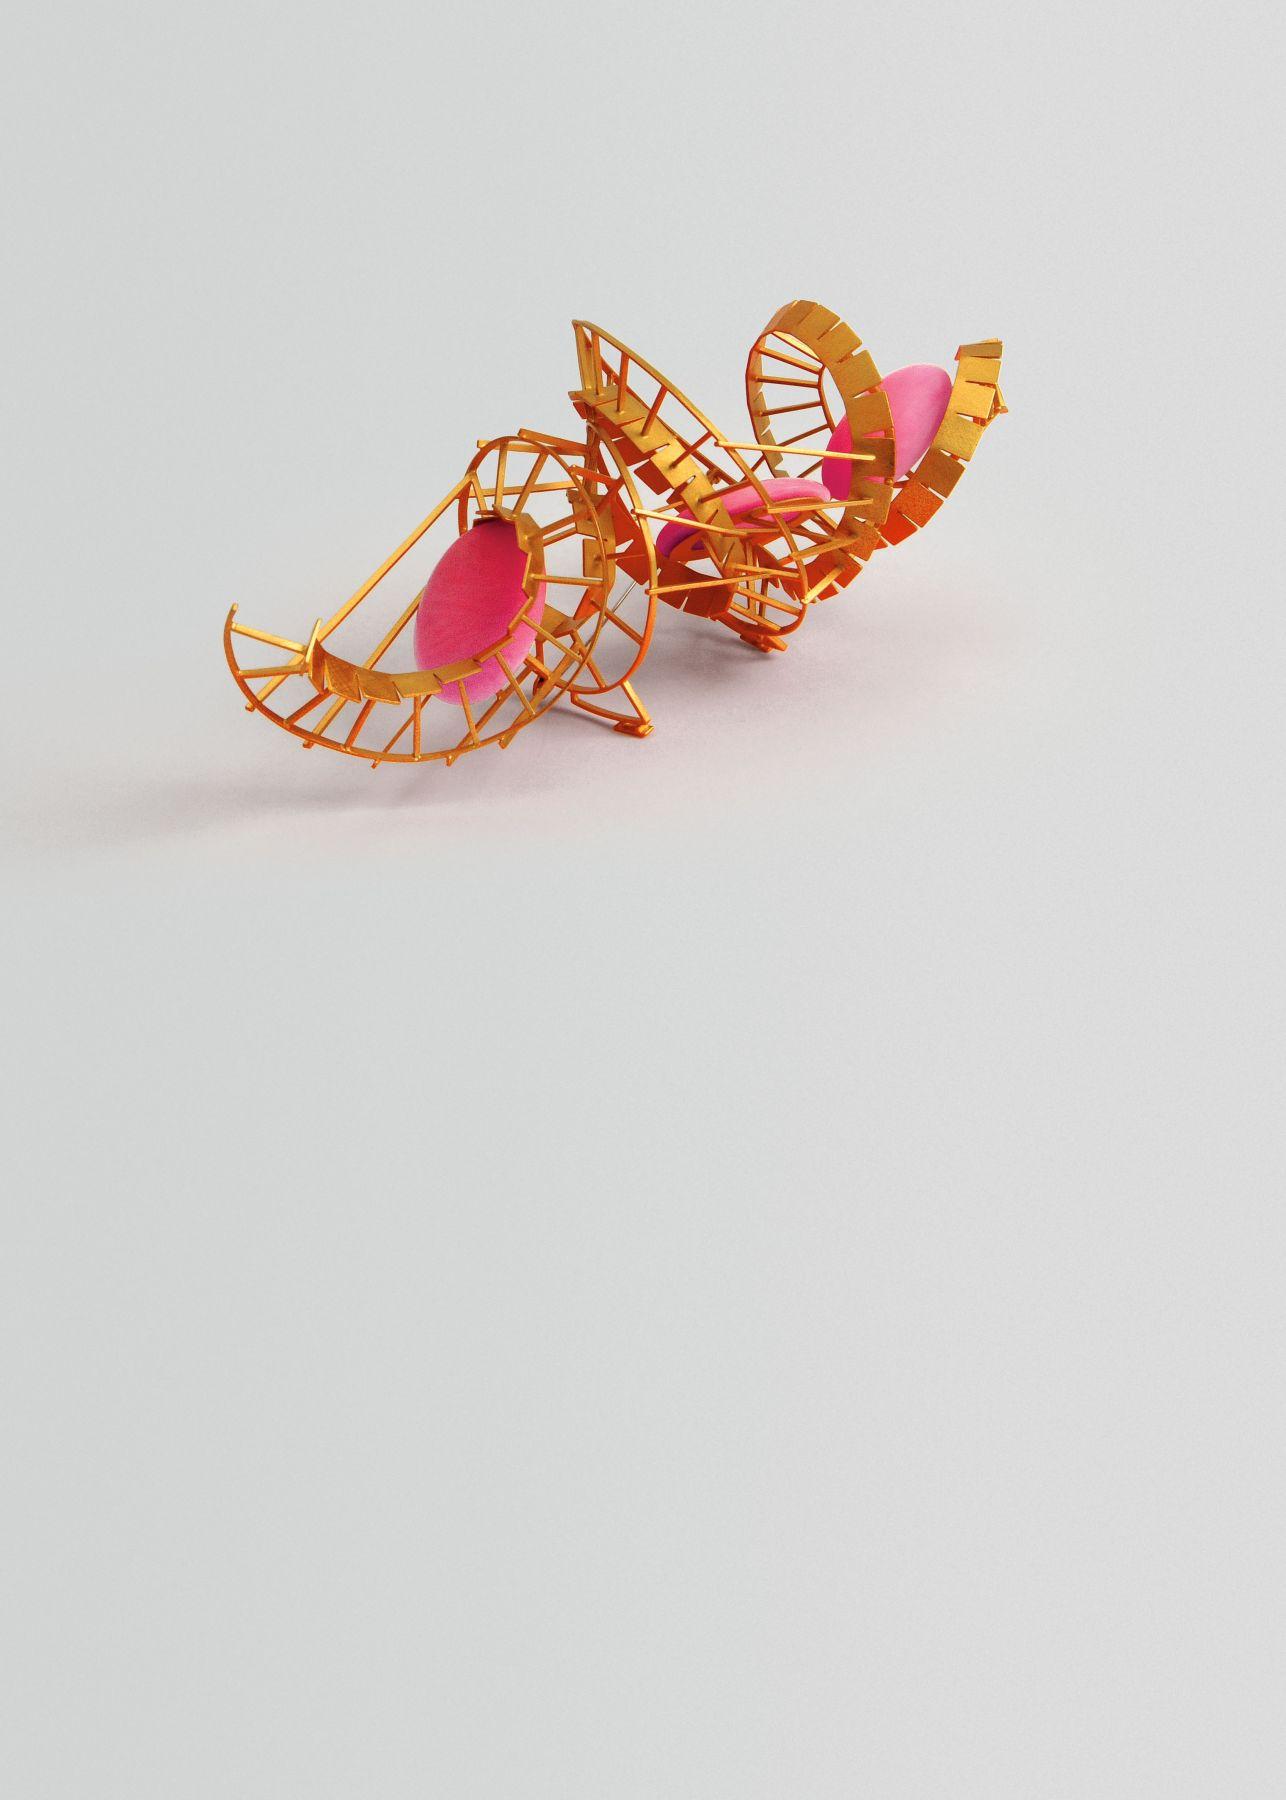 Norman Weber, German, brooch, contemporary jewelry